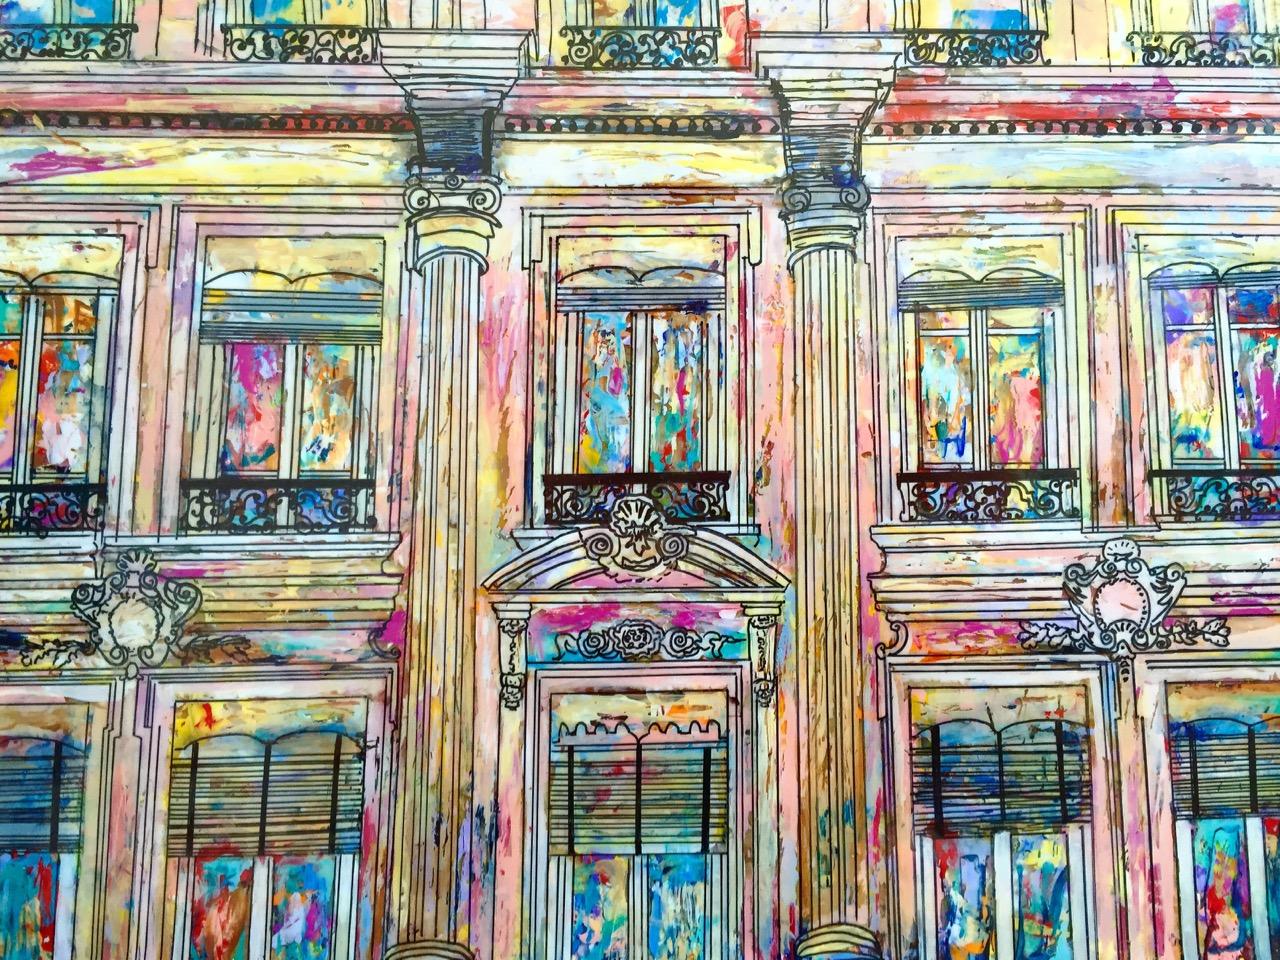 "LES FENETRES DE PARIS (PARIS WINDOWS)   14 x 11""   Acrylic, acetate, ink, and epoxy resin on bamboo paper   SOLD"